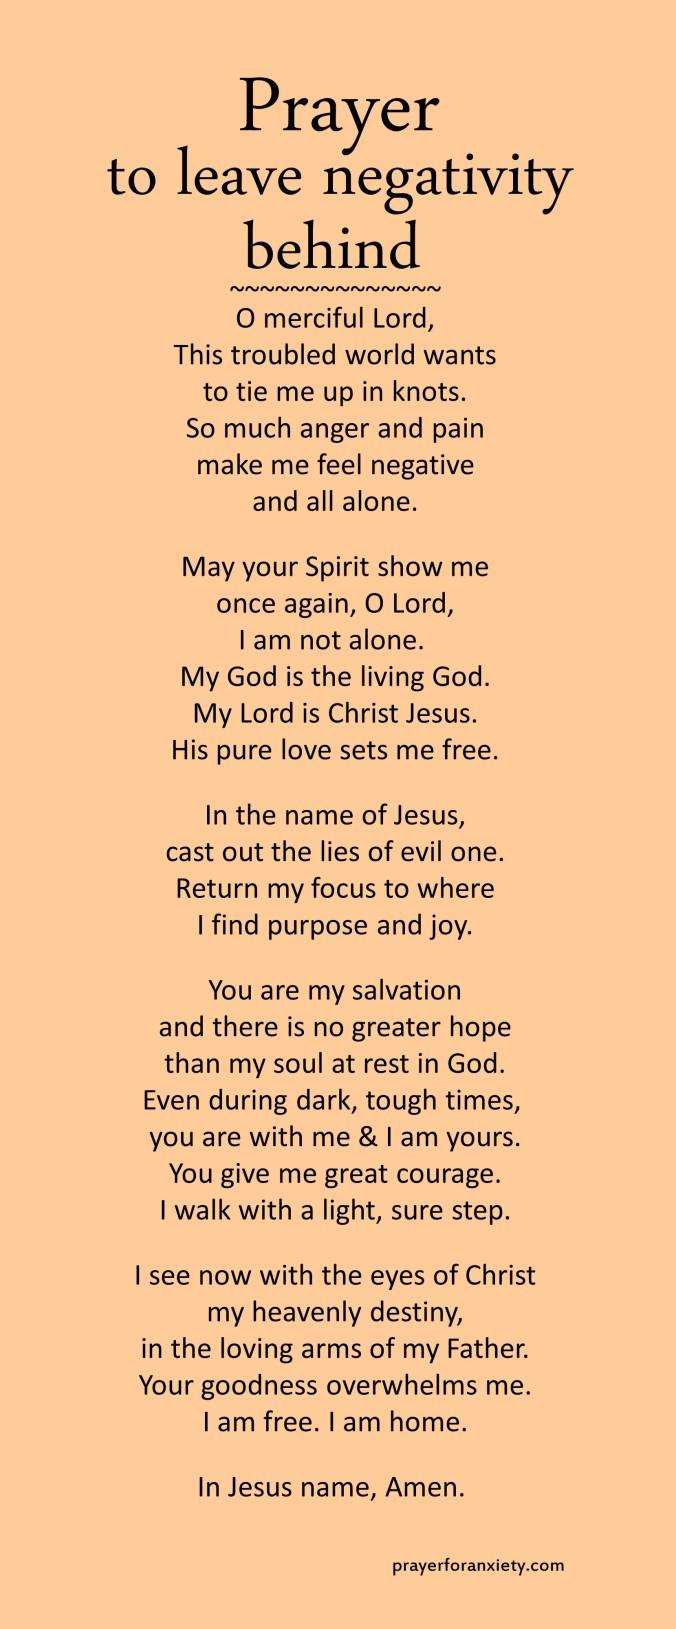 Prayer to leave negativity behind